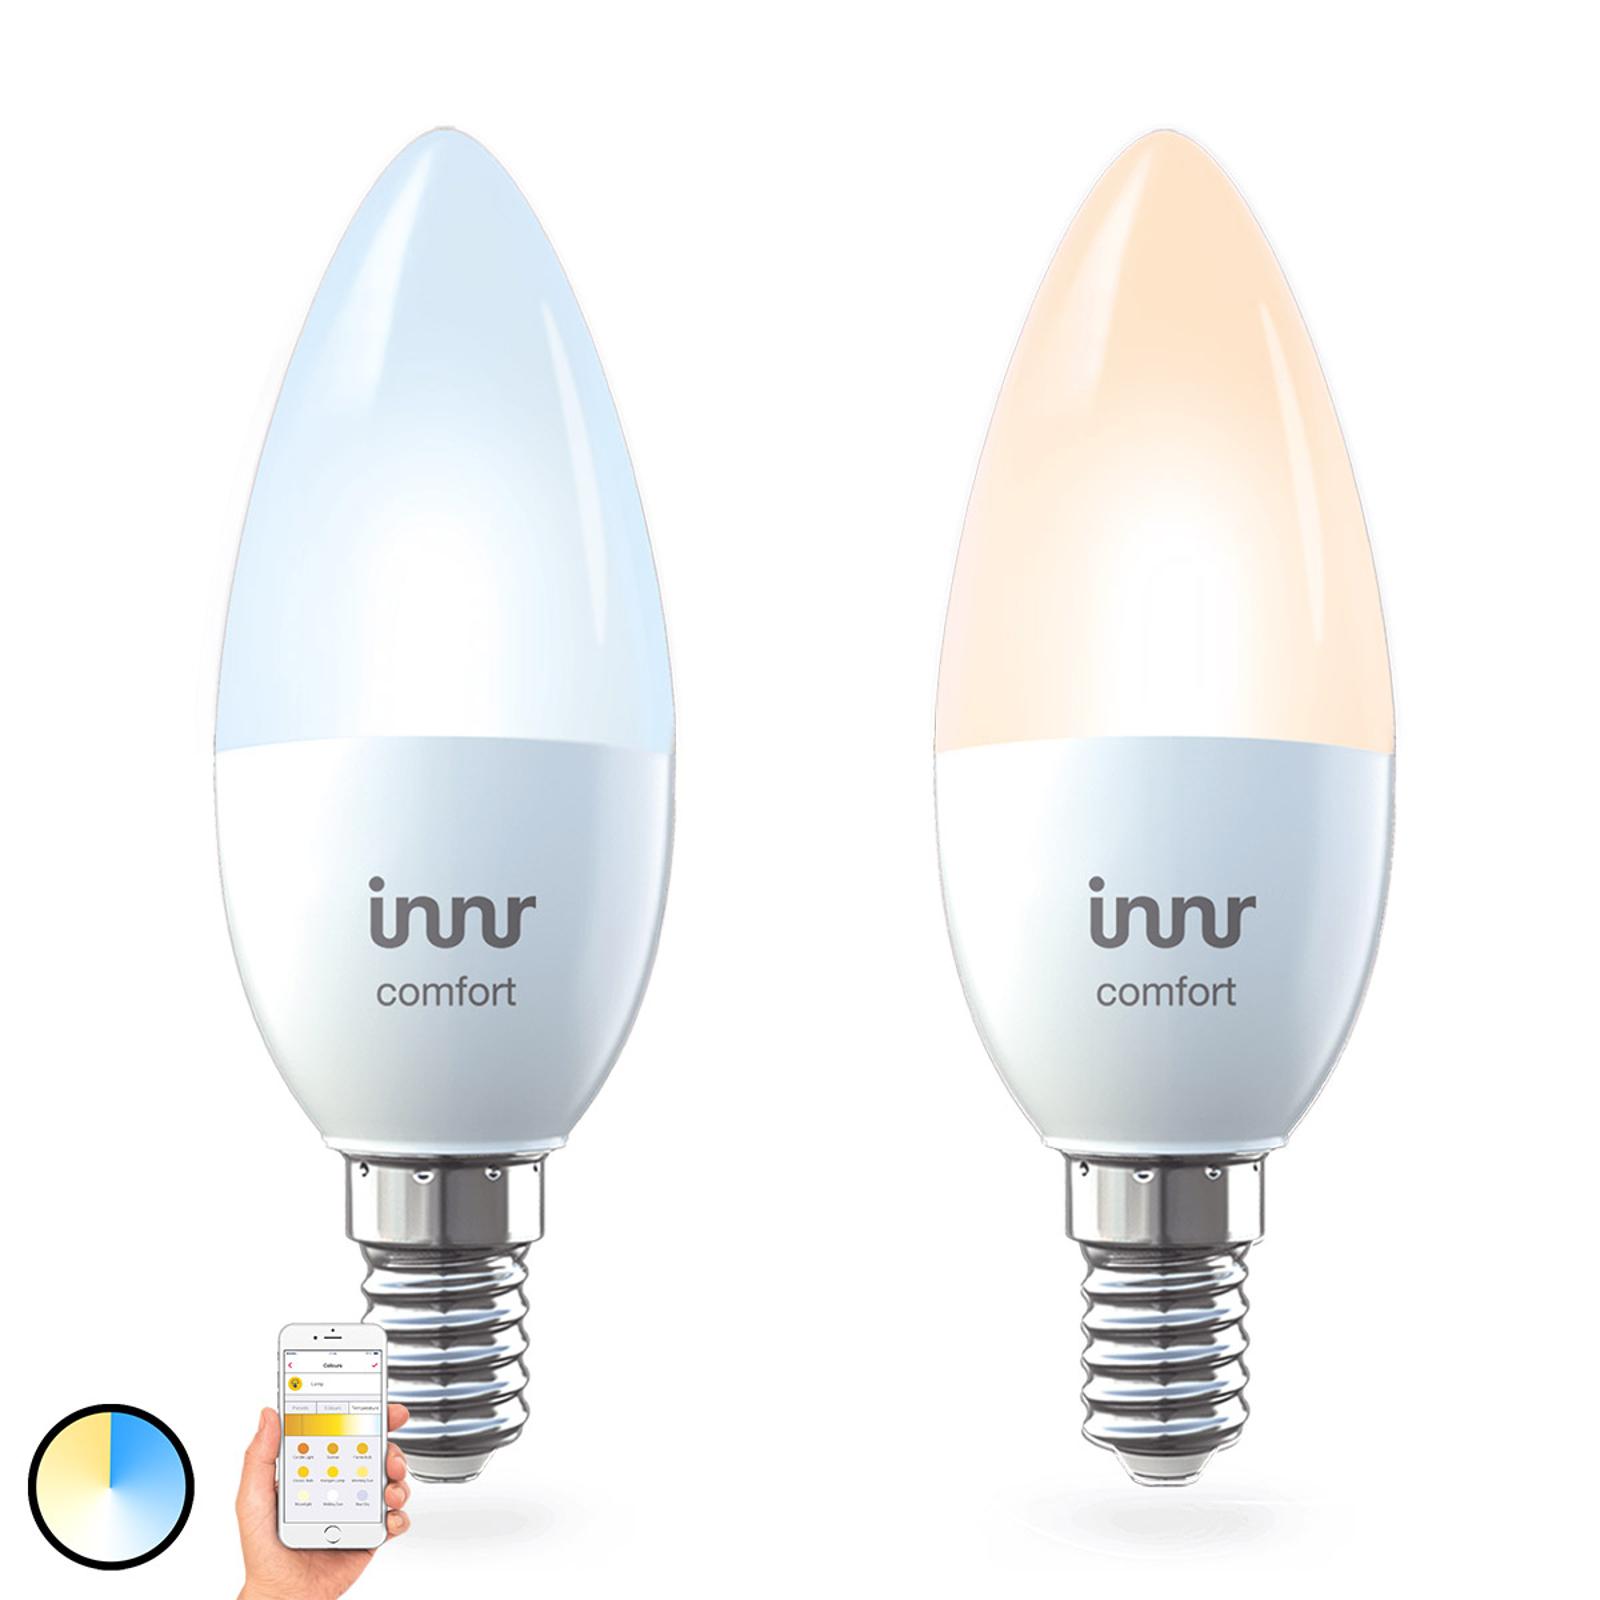 E14 5,8 W LED lamp Innr Smart Candle Comfort per 2